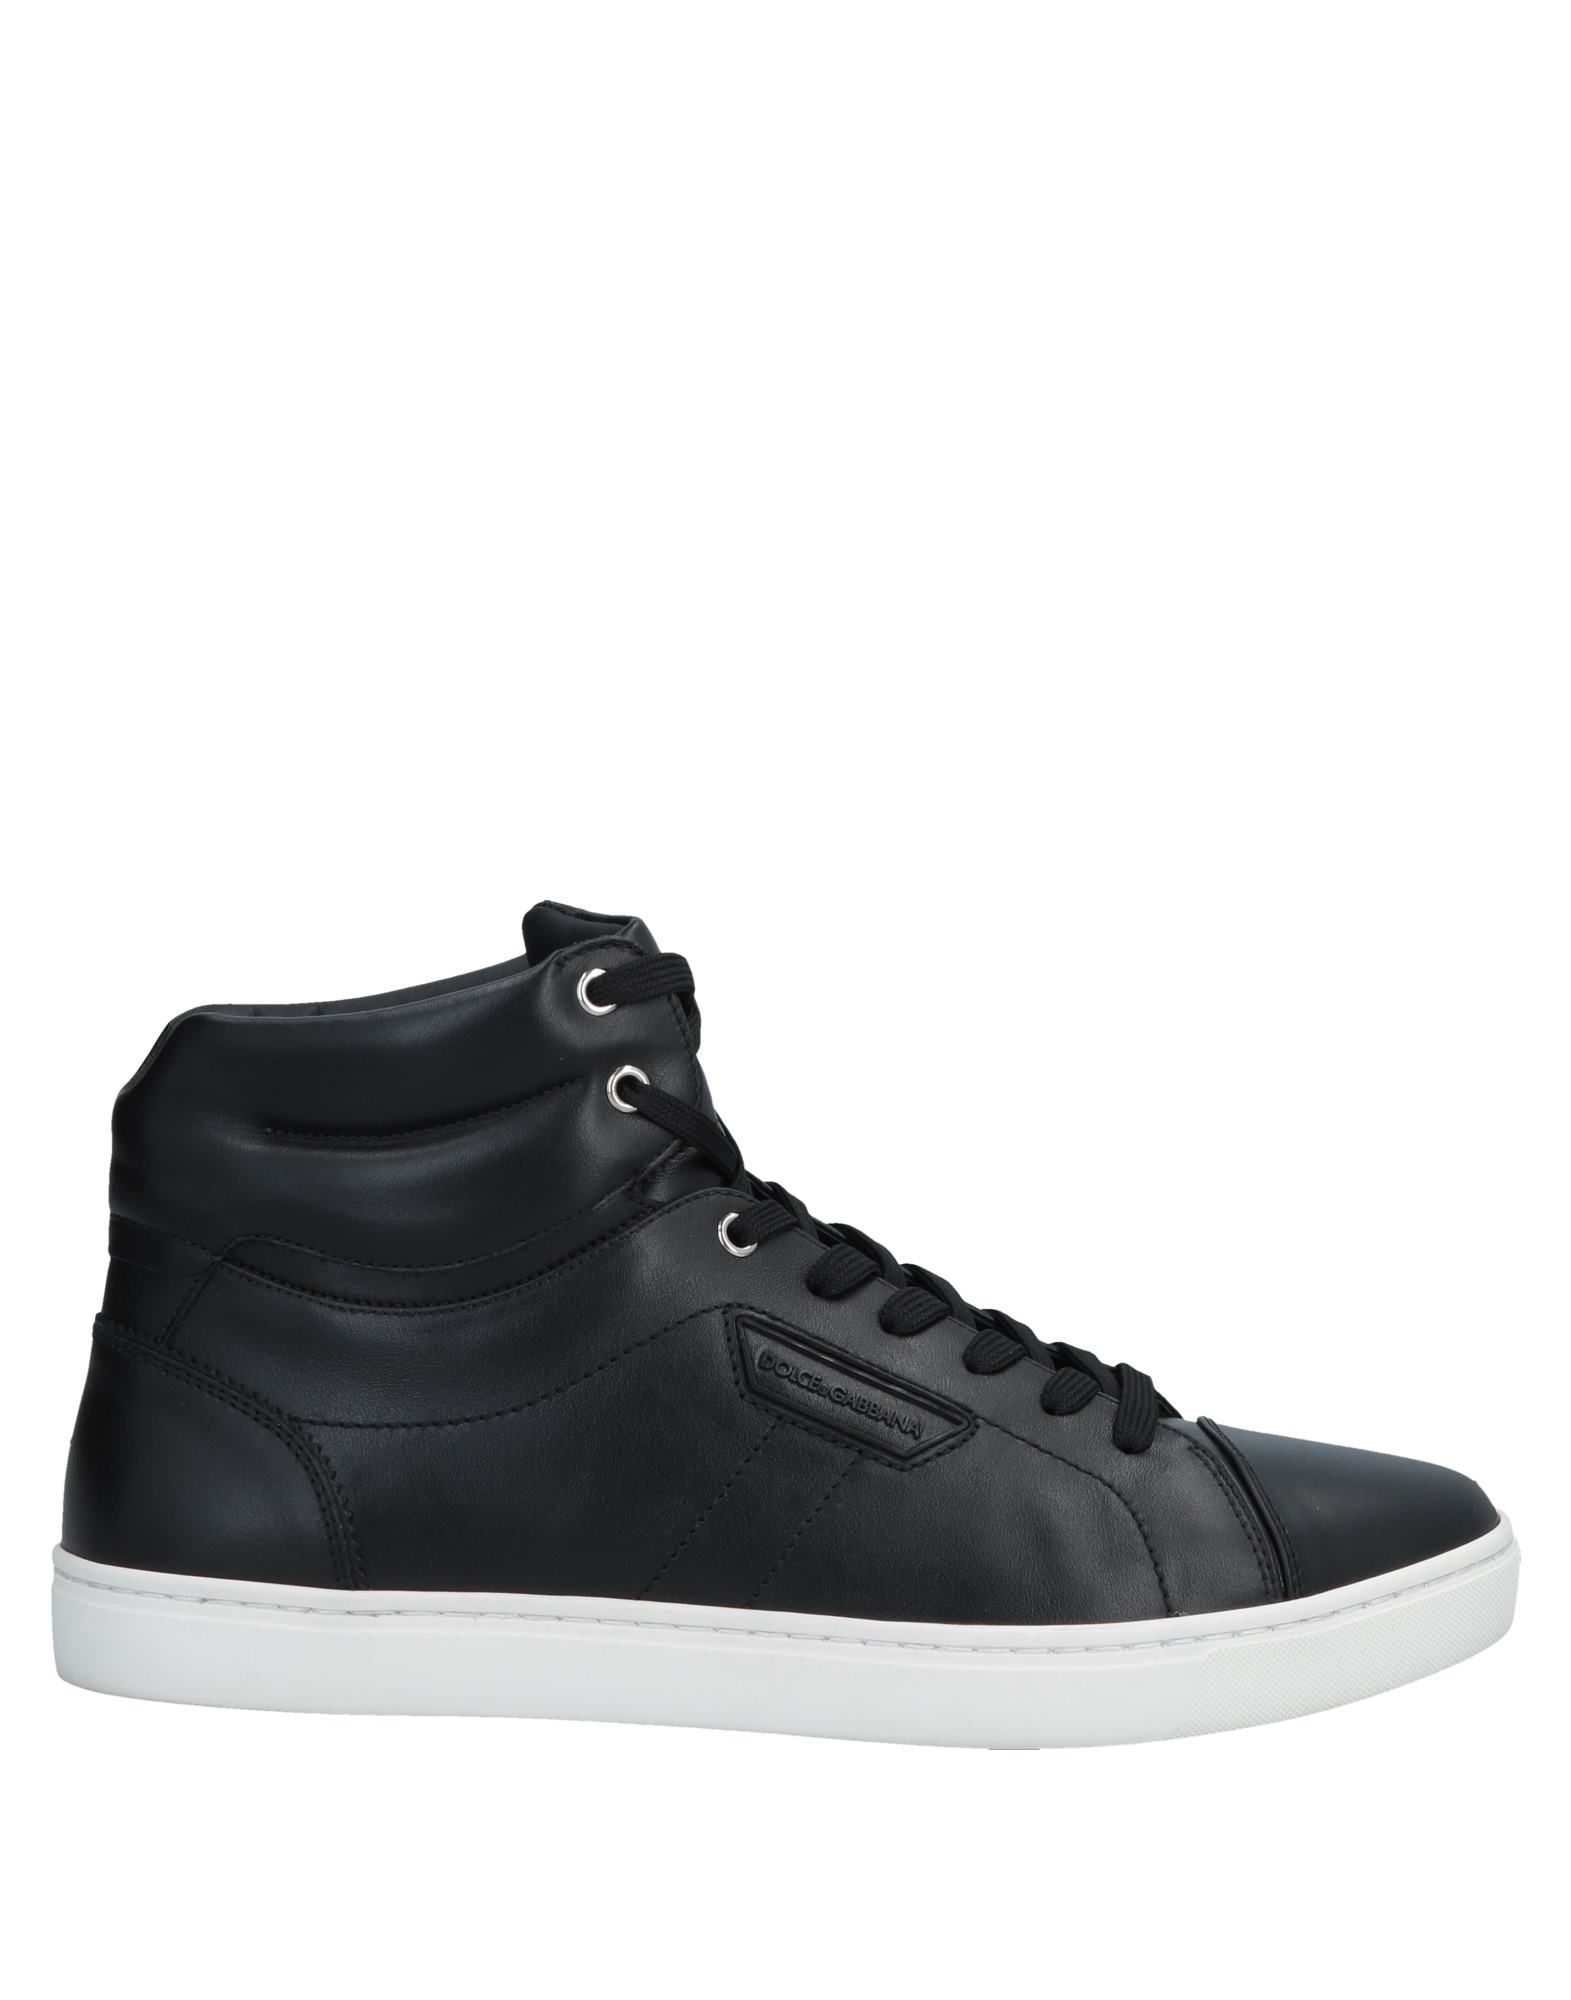 b43cc70c Dolce & Gabbana Sneakers for Men - Dolce & Gabbana Footwear | YOOX